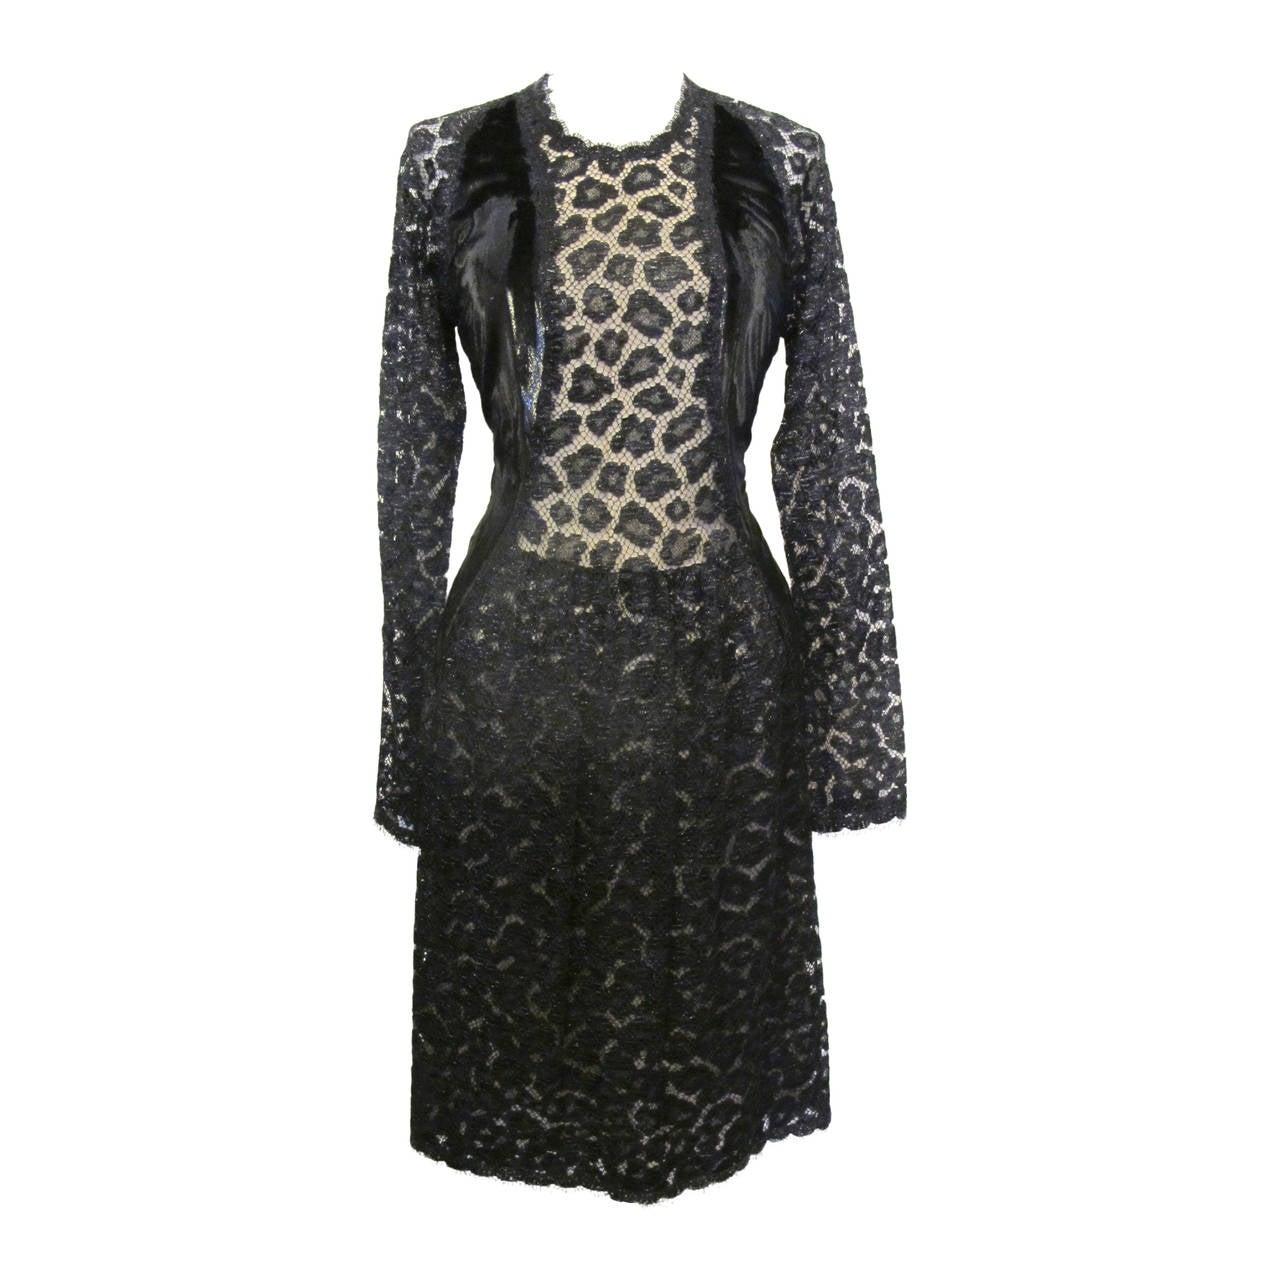 Geoffrey Beene Black Lace Cocktail Dress with Leopard Design 1